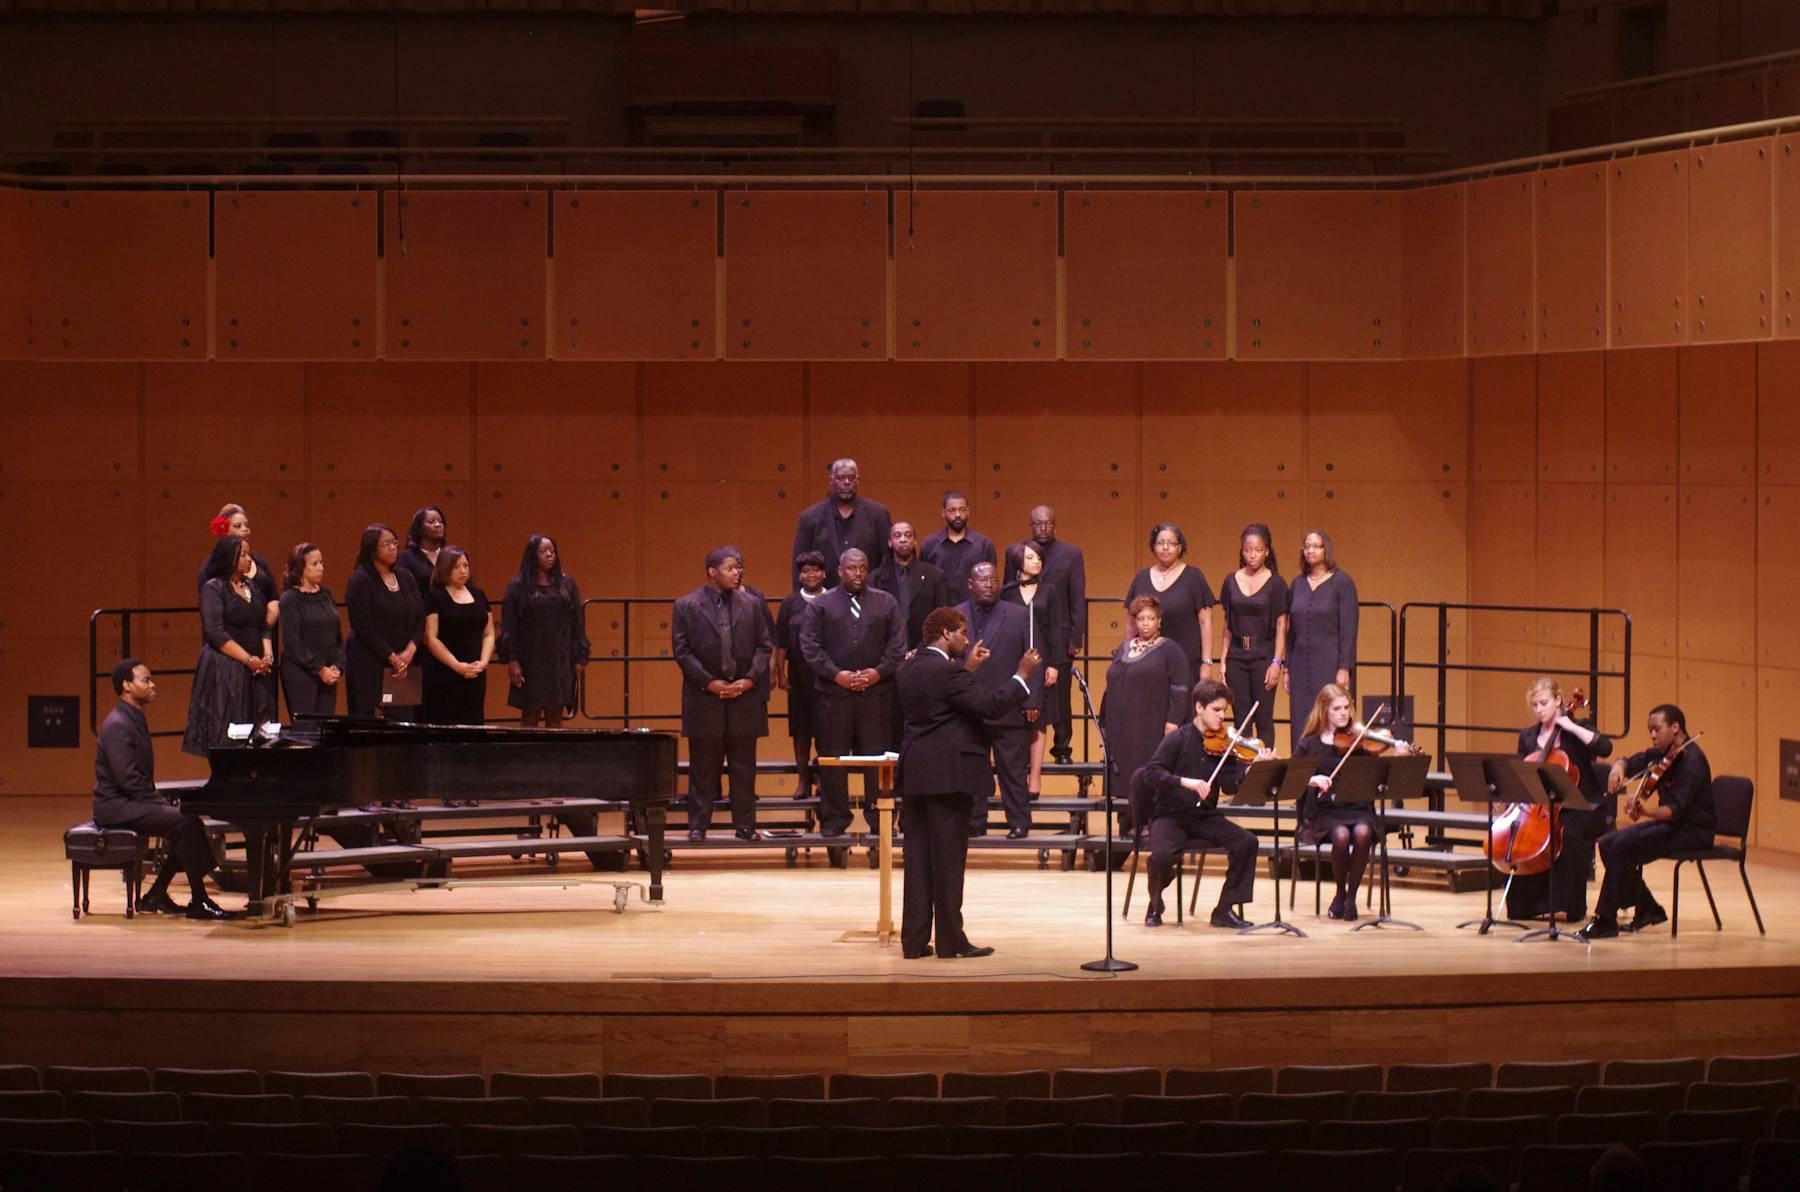 Performance at Illinois State University